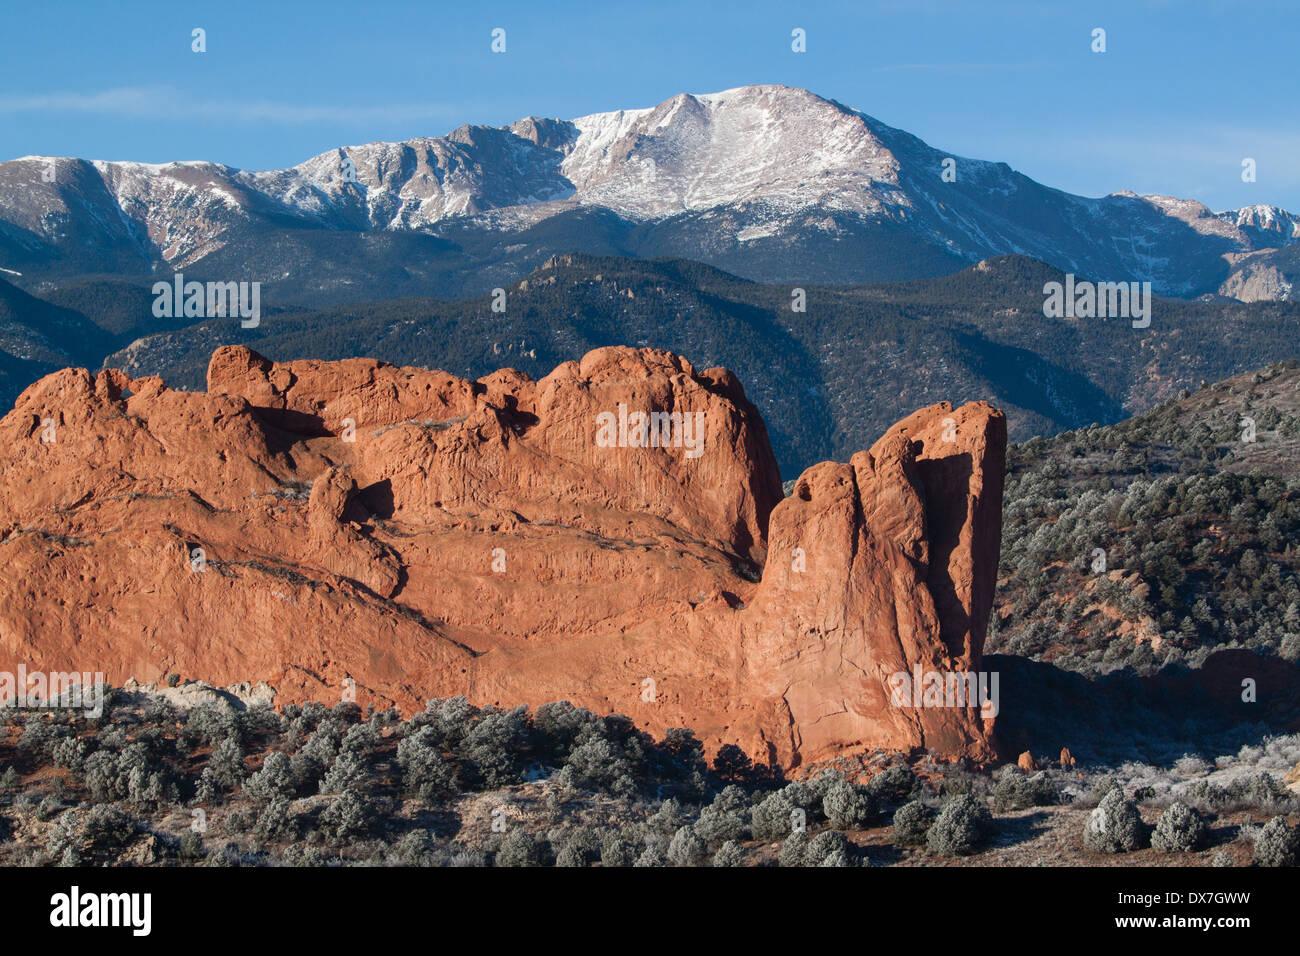 North Gateway Rock and Pikes Peak near Colorado Springs, Colorado - Stock Image